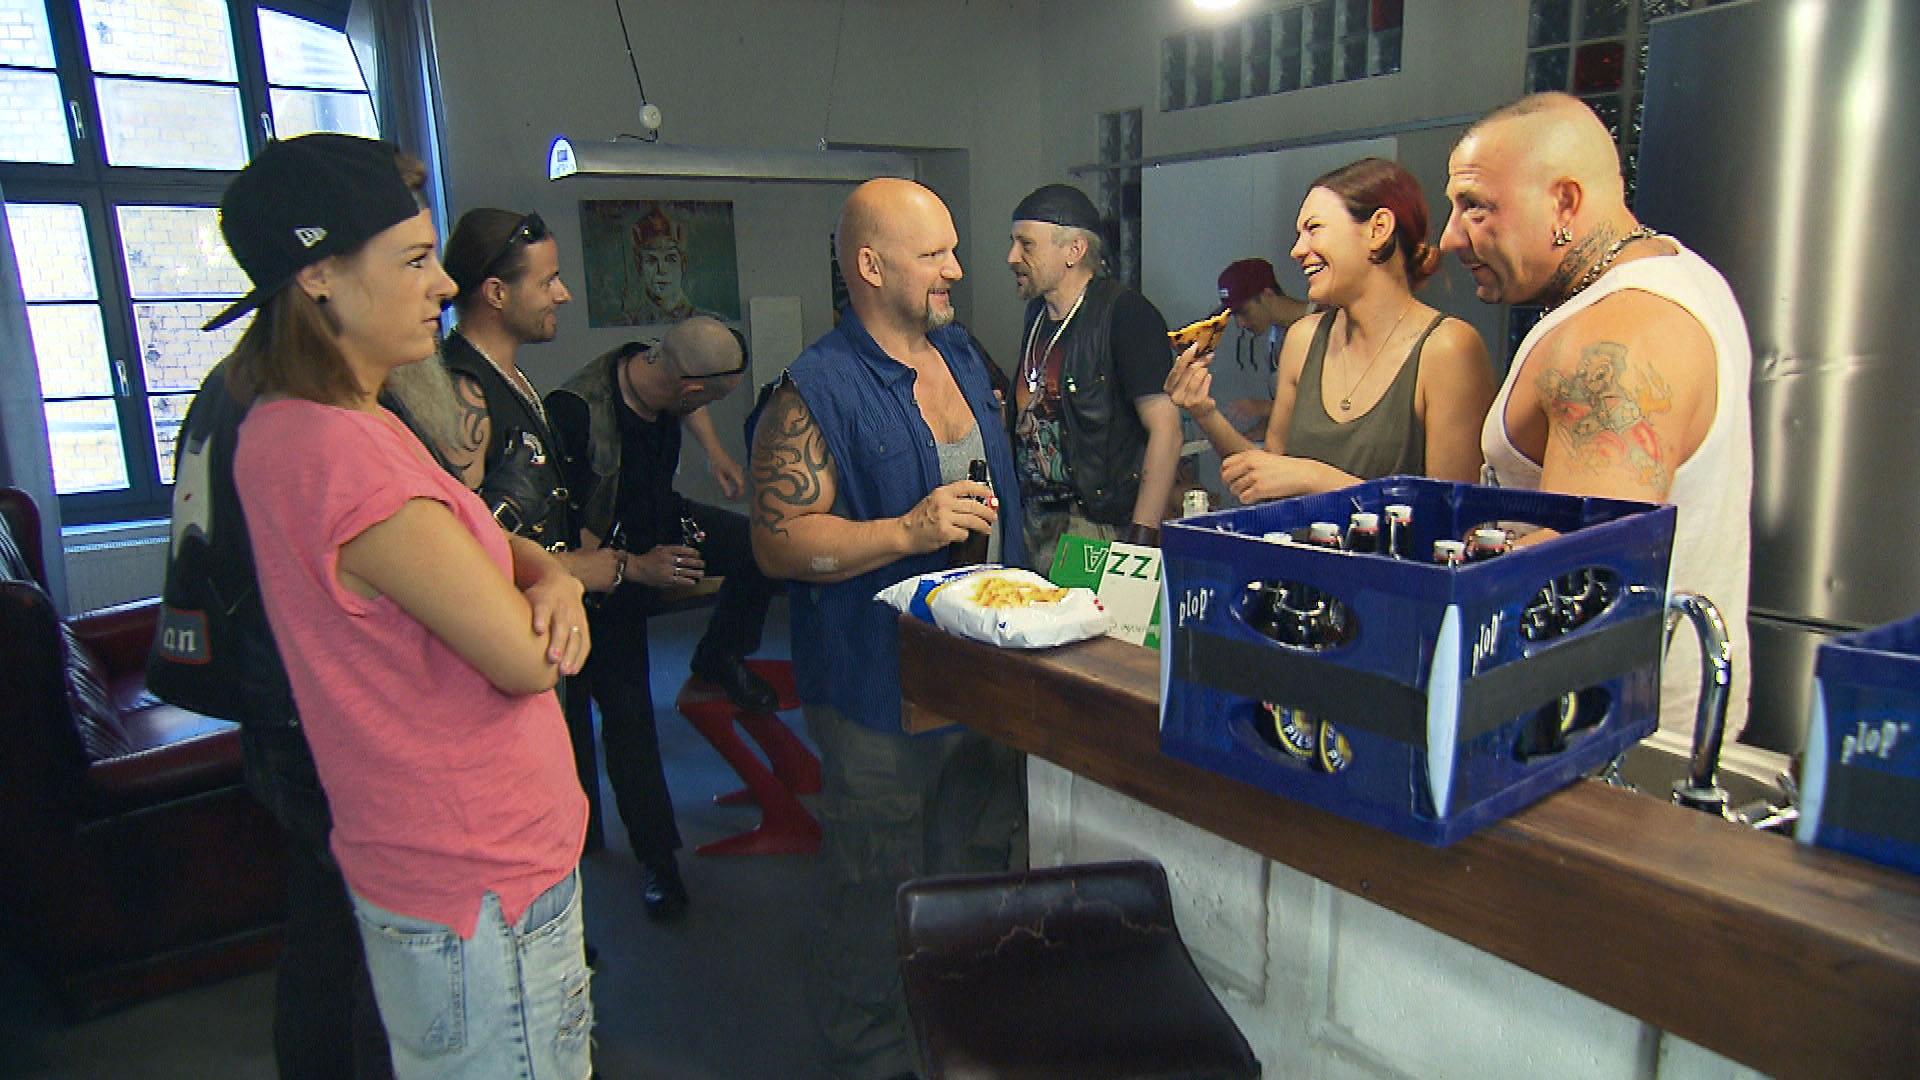 Die WG feiert Abschied. v.l.n.r.: Alina, Joe, Jessica, Fabrizio (Quelle: RTL 2)